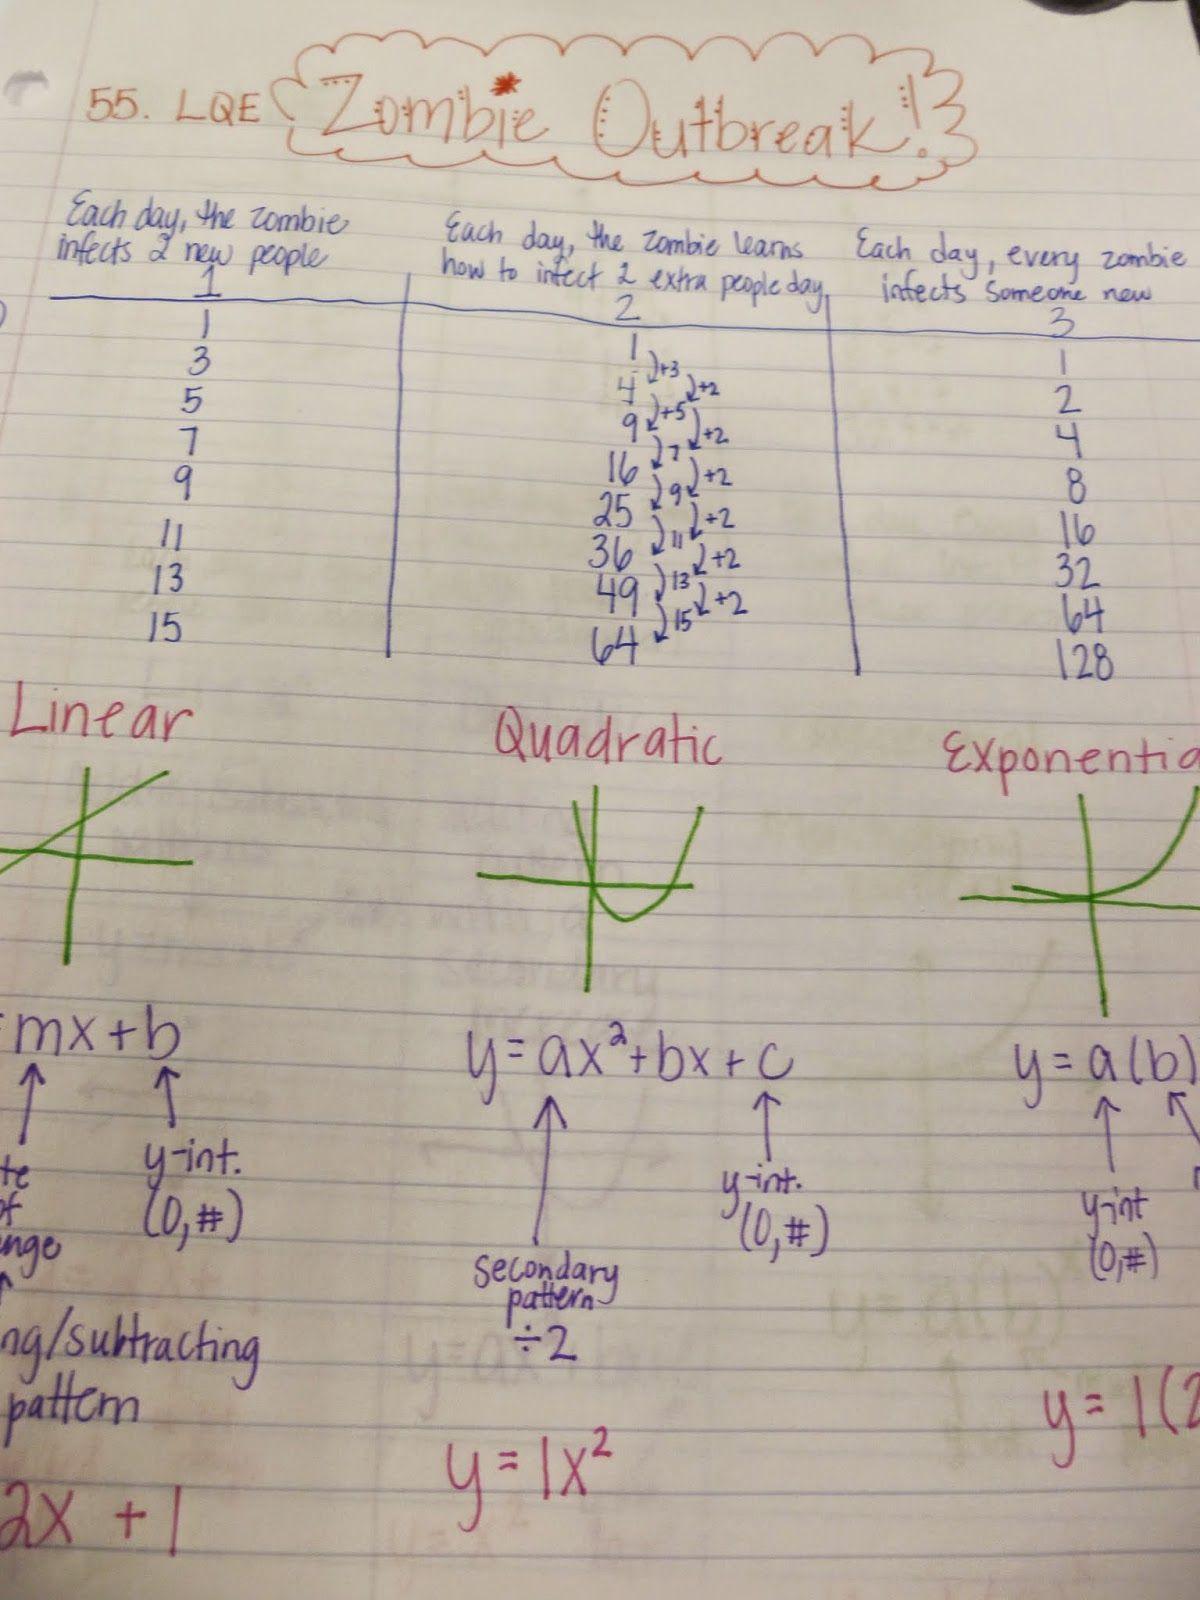 Quadratic Functions Worksheet Answers Friday Freebies Paring Linear Quadratic Exponential